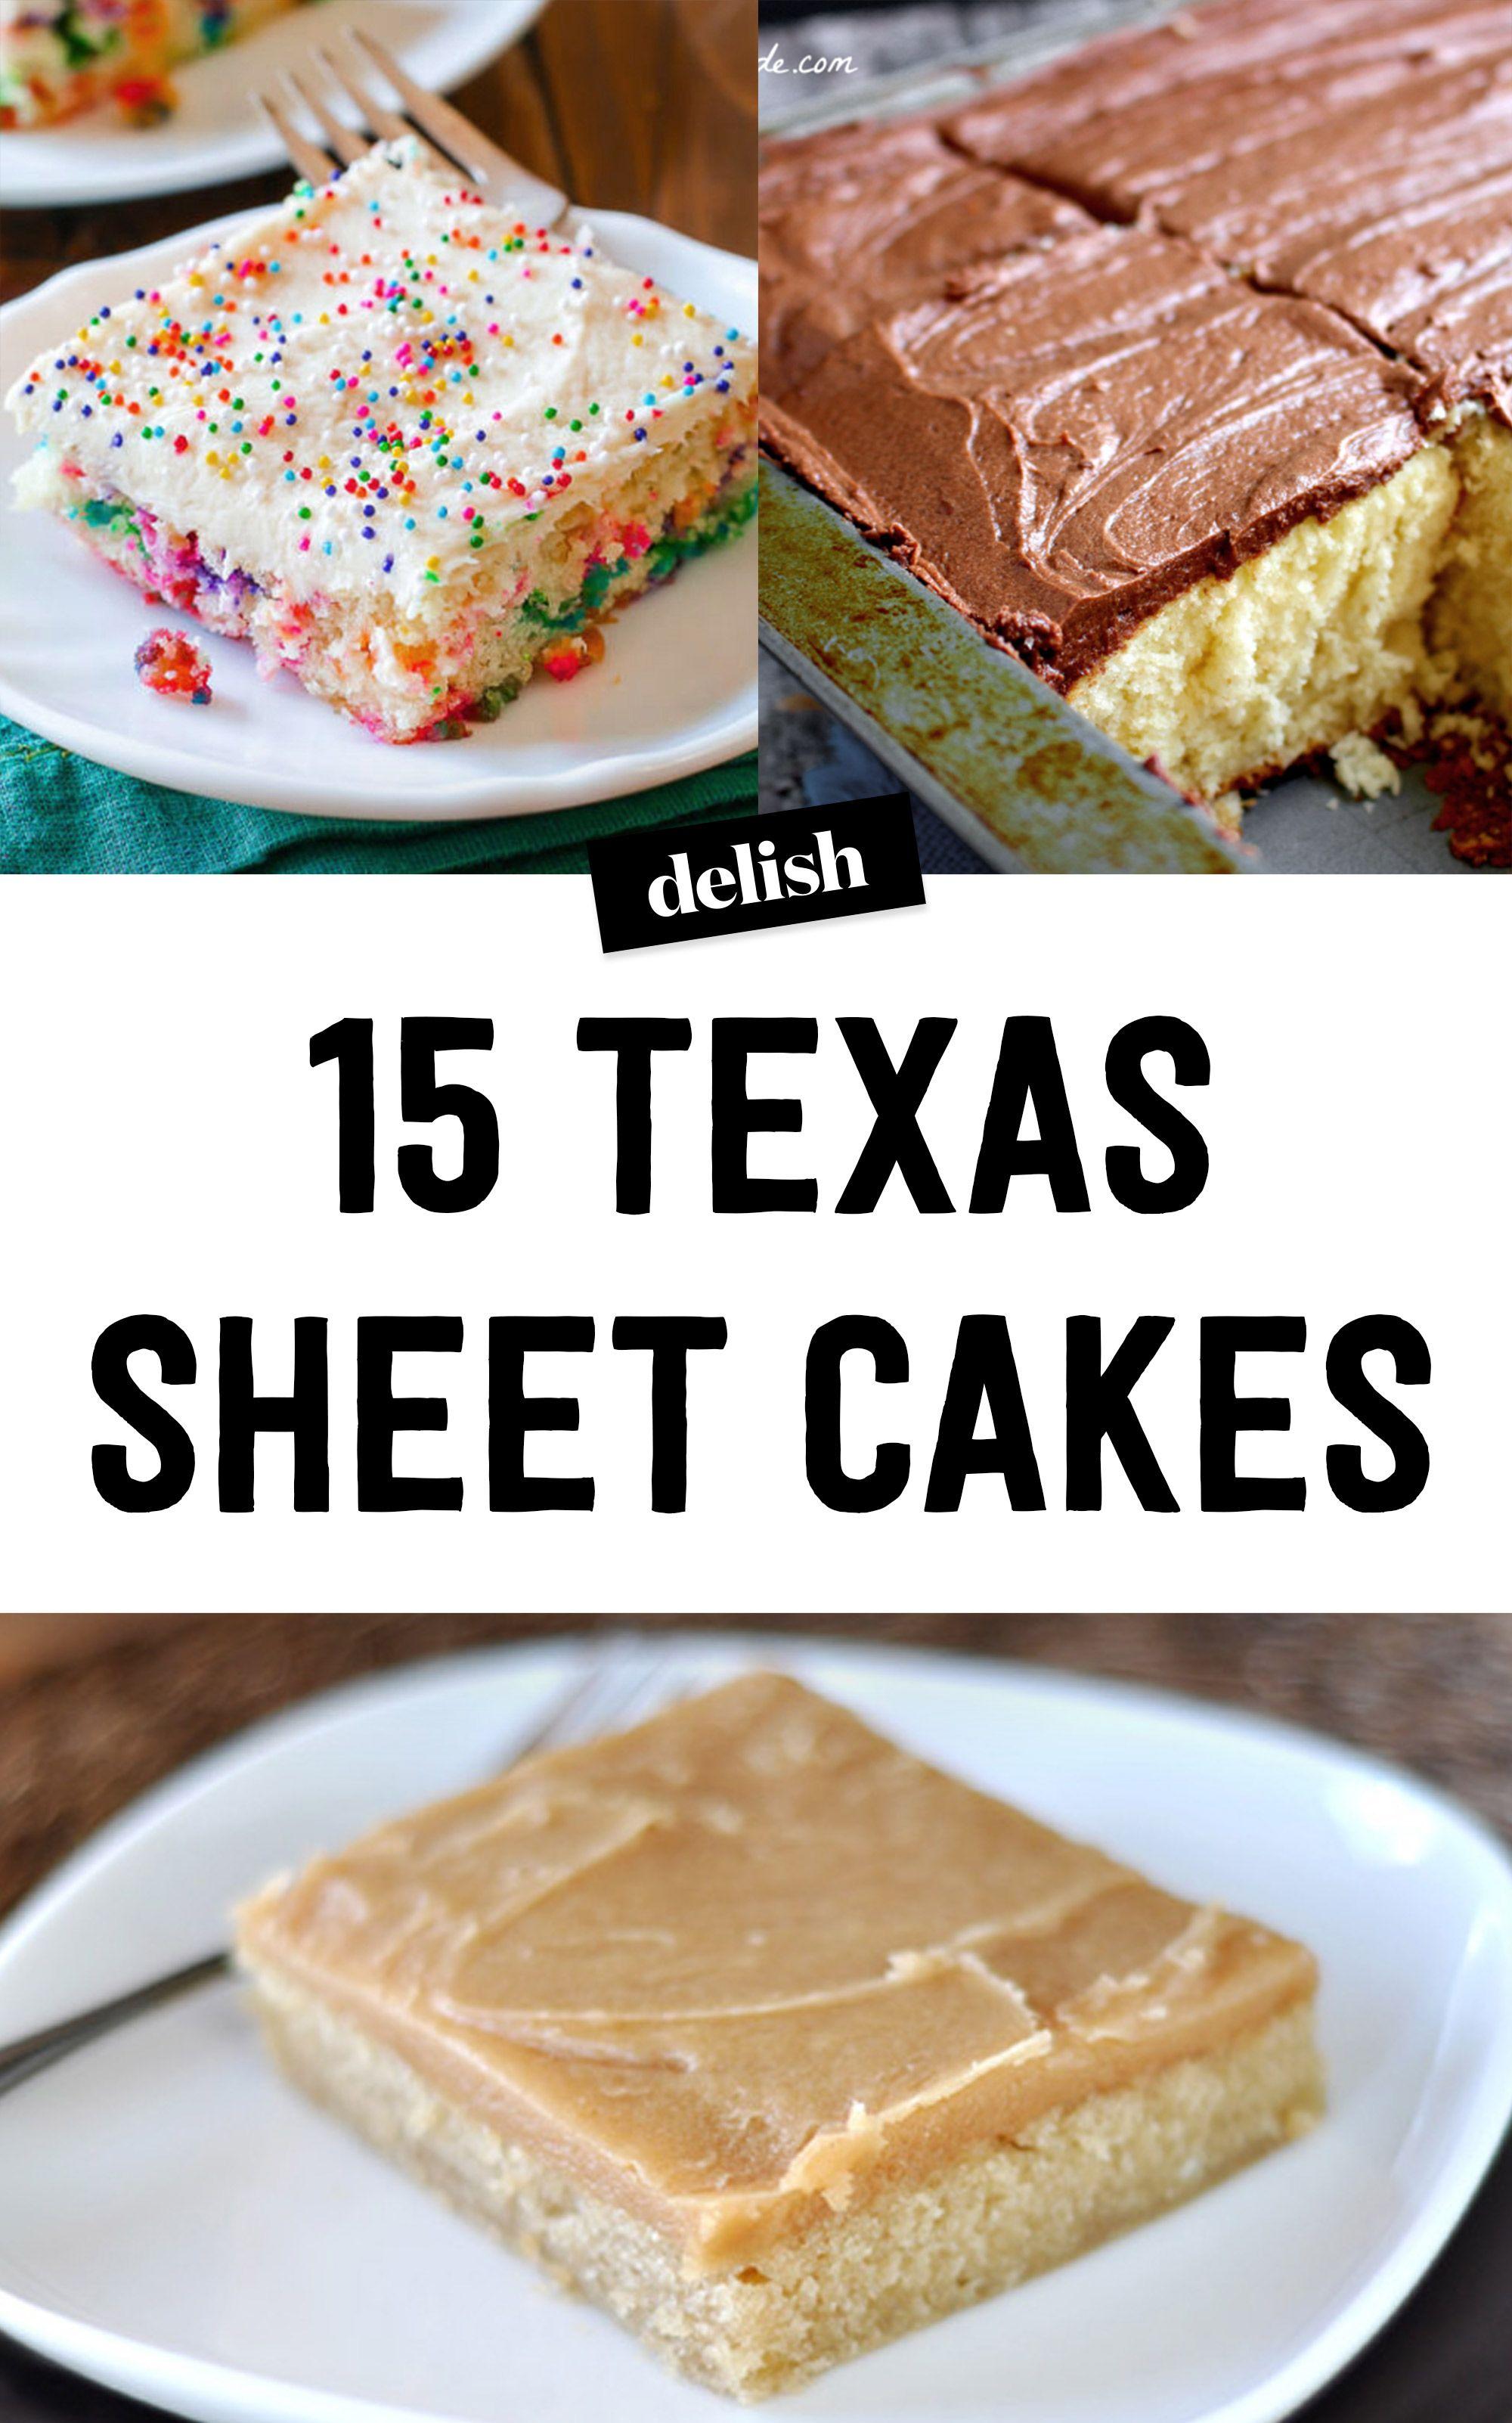 20 BEST TEXAS SHEET CAKE RECIPES DELISH COM